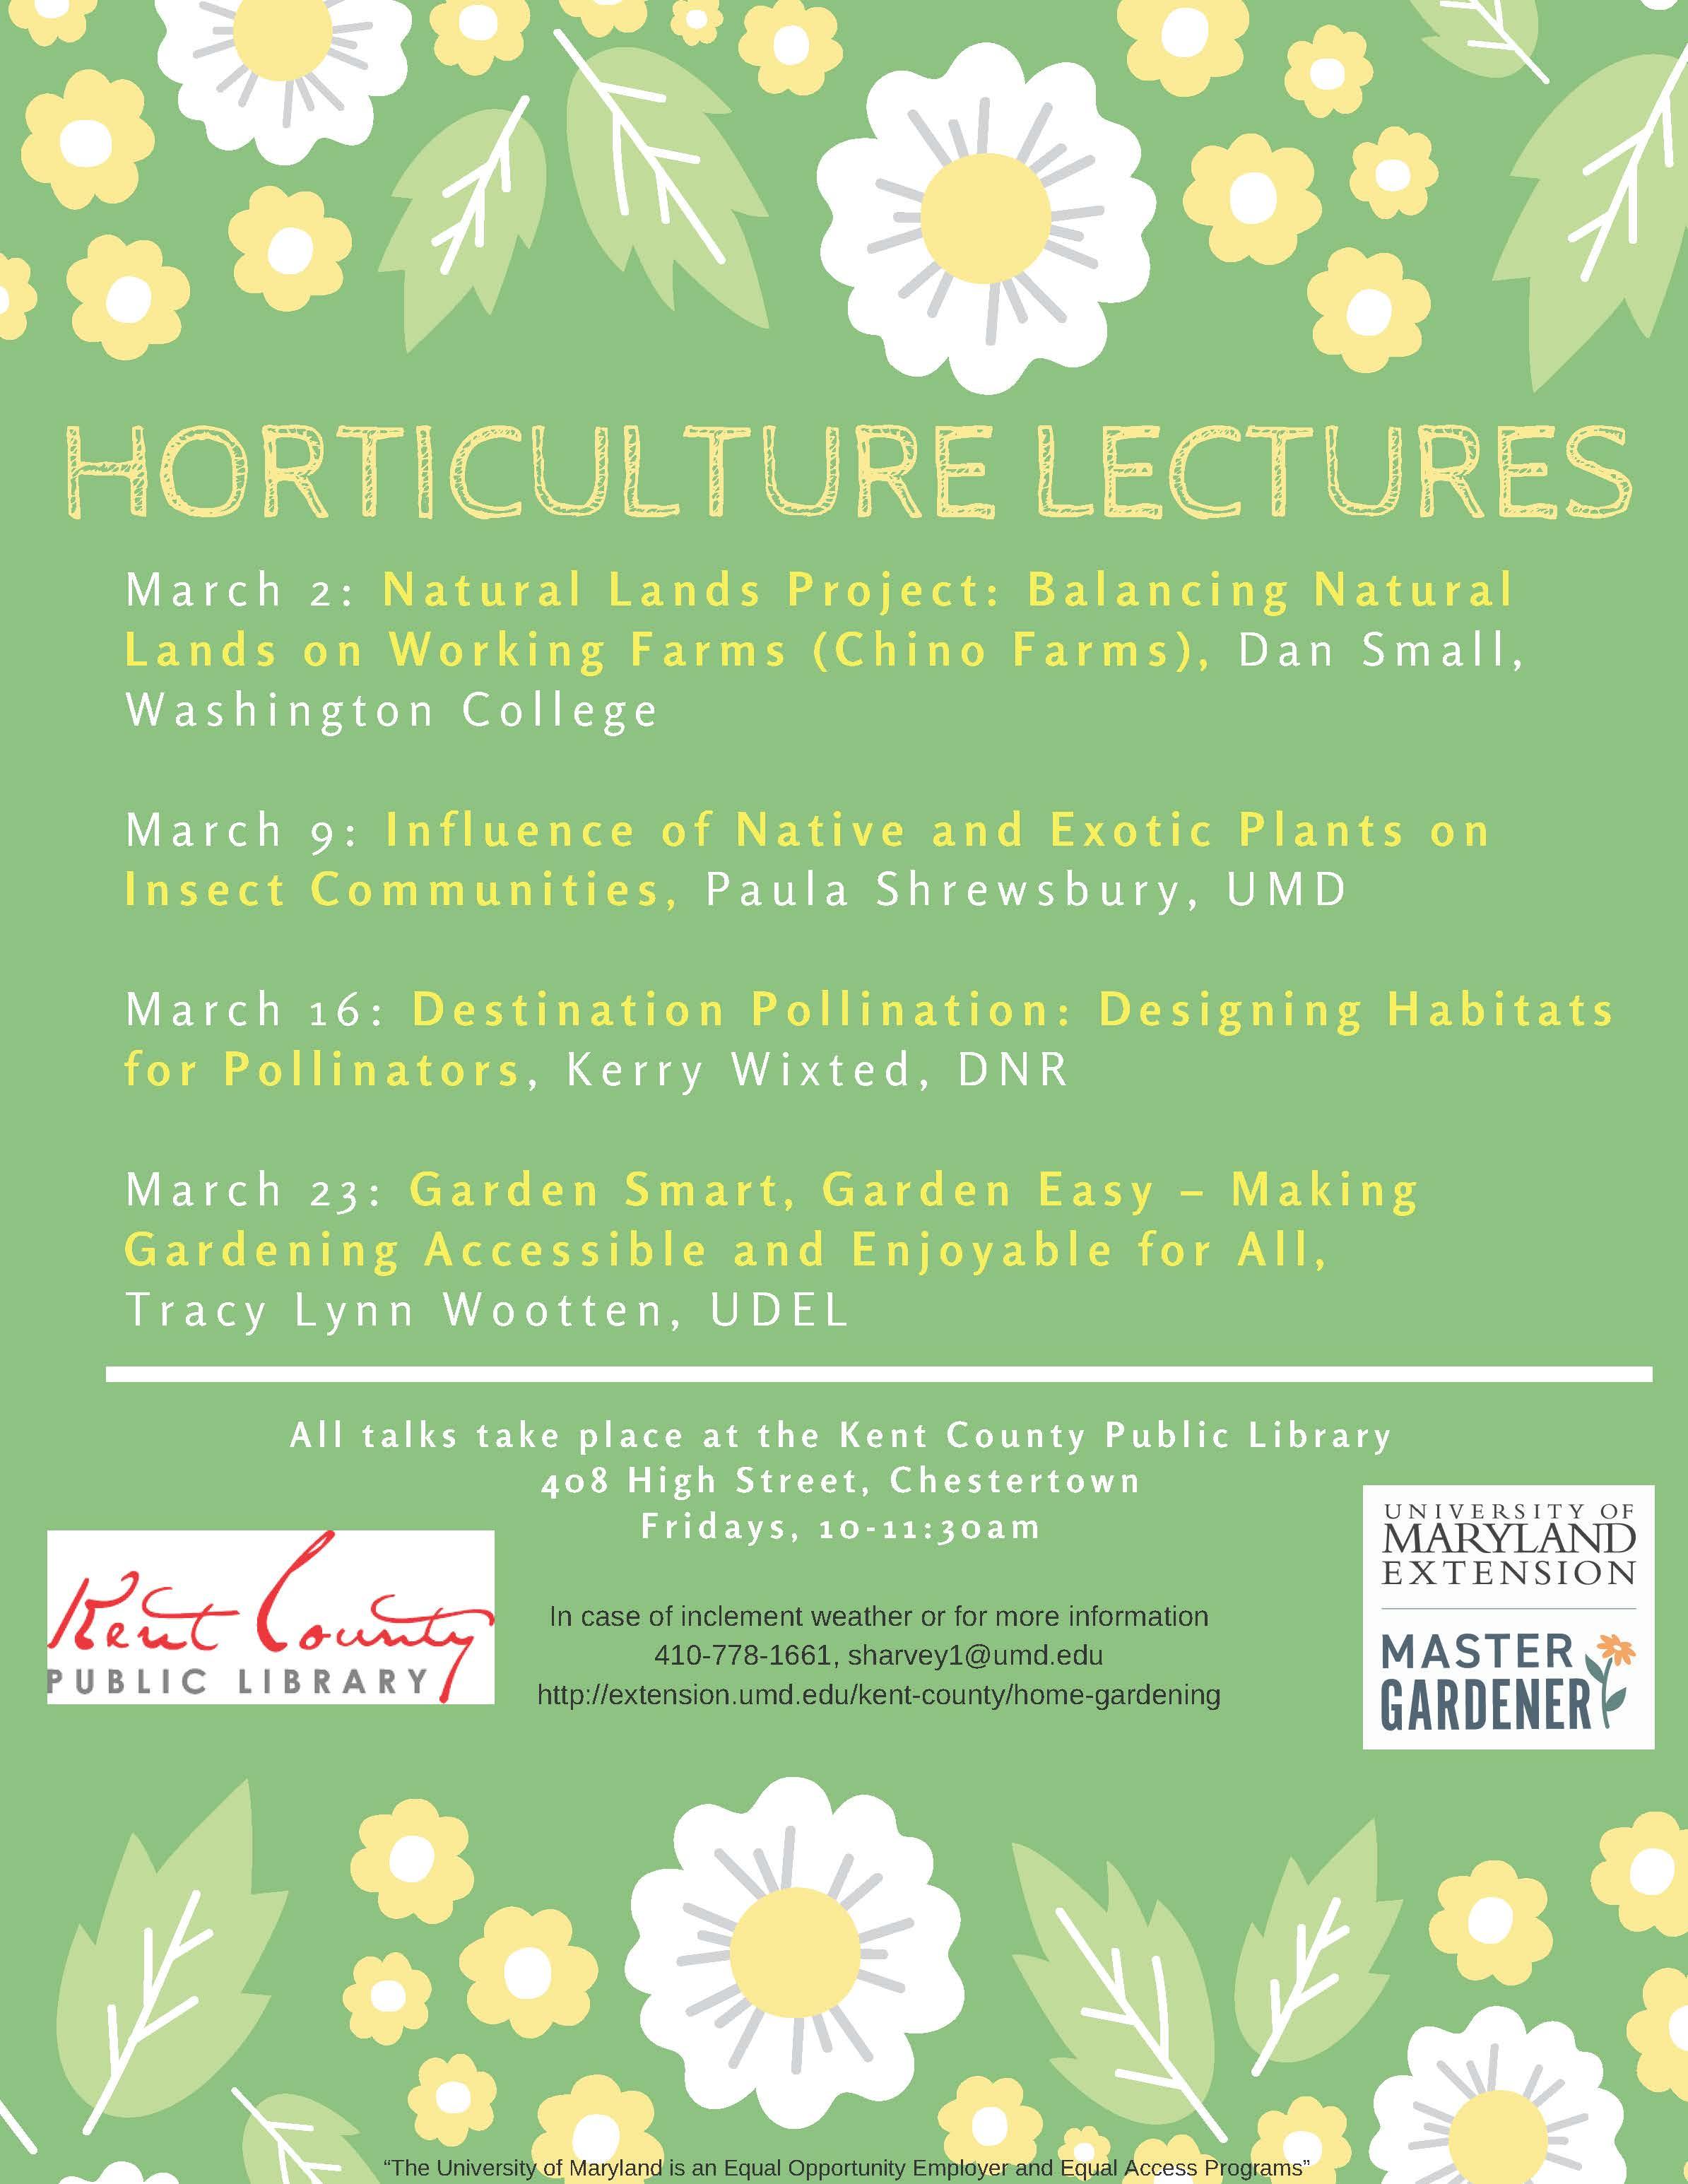 Destination Pollination: Designing Habitats for Pollination